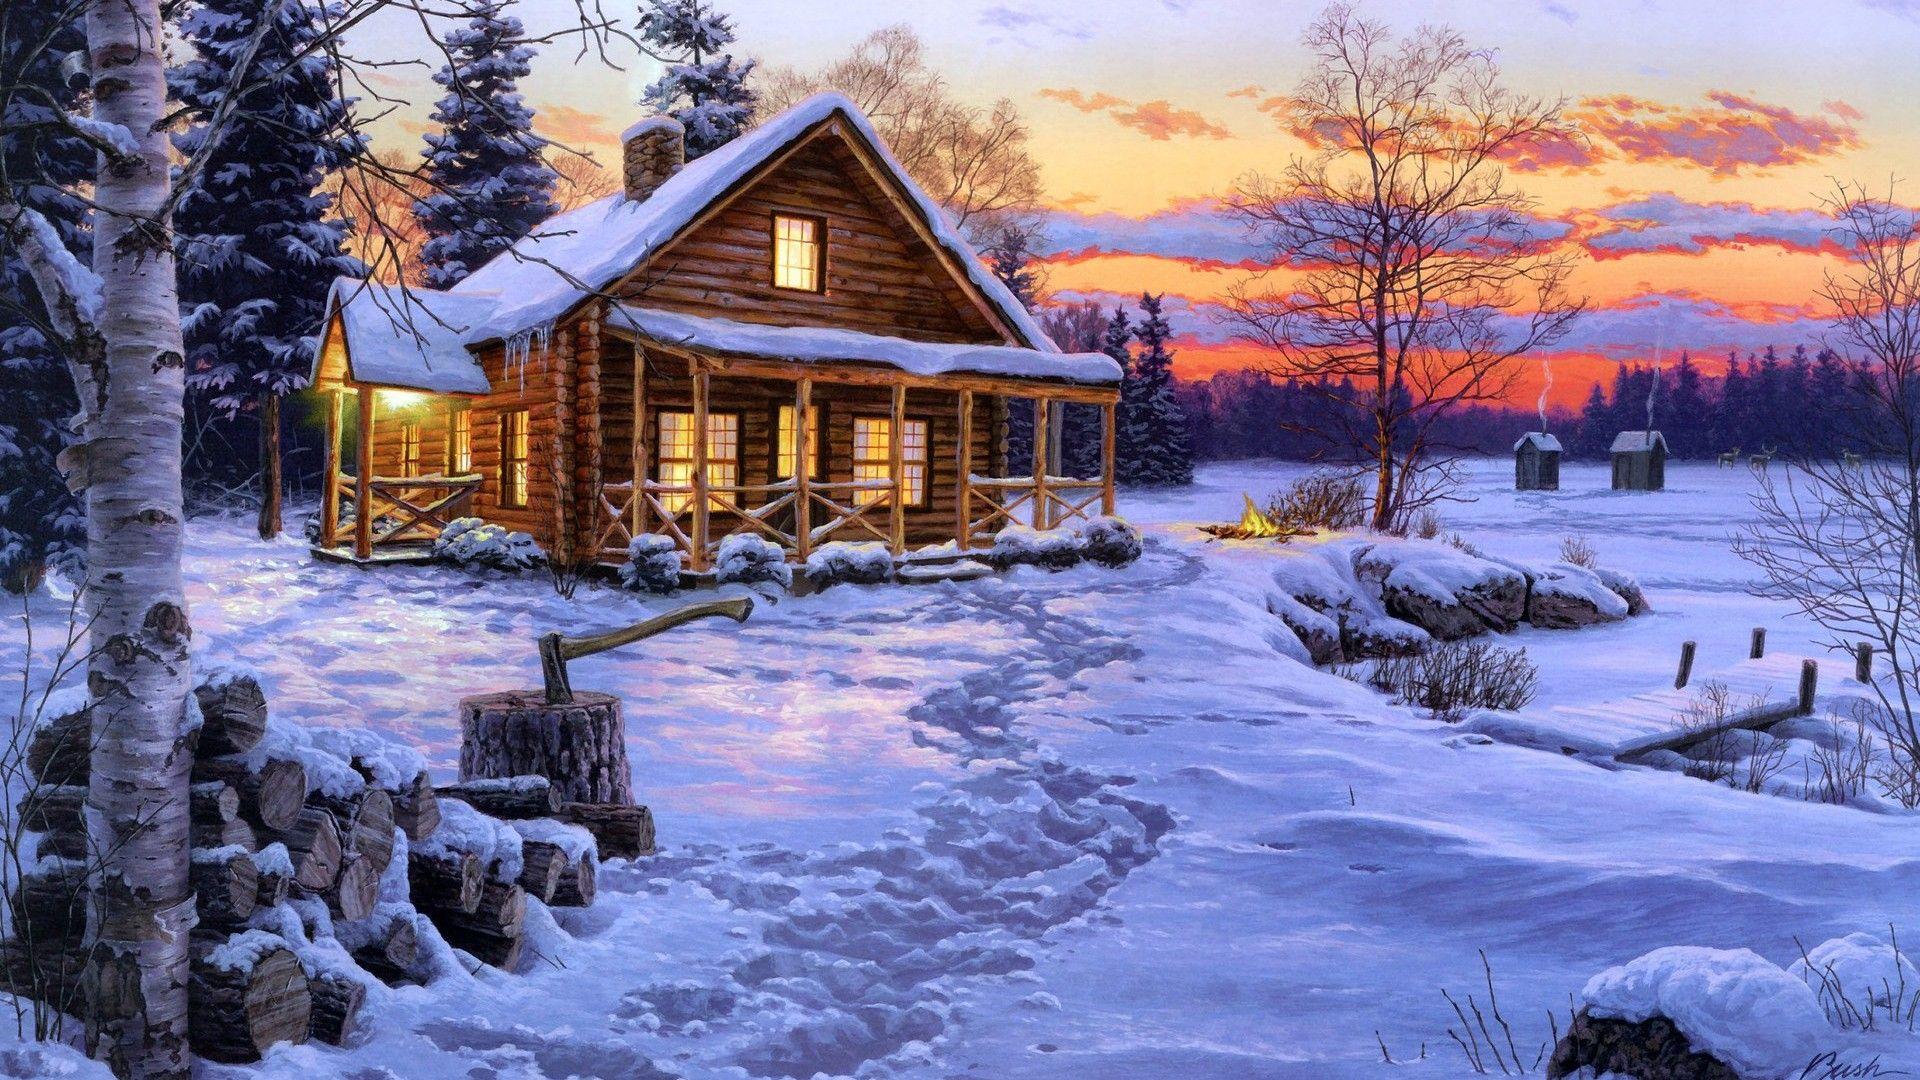 Free Winter full hd image